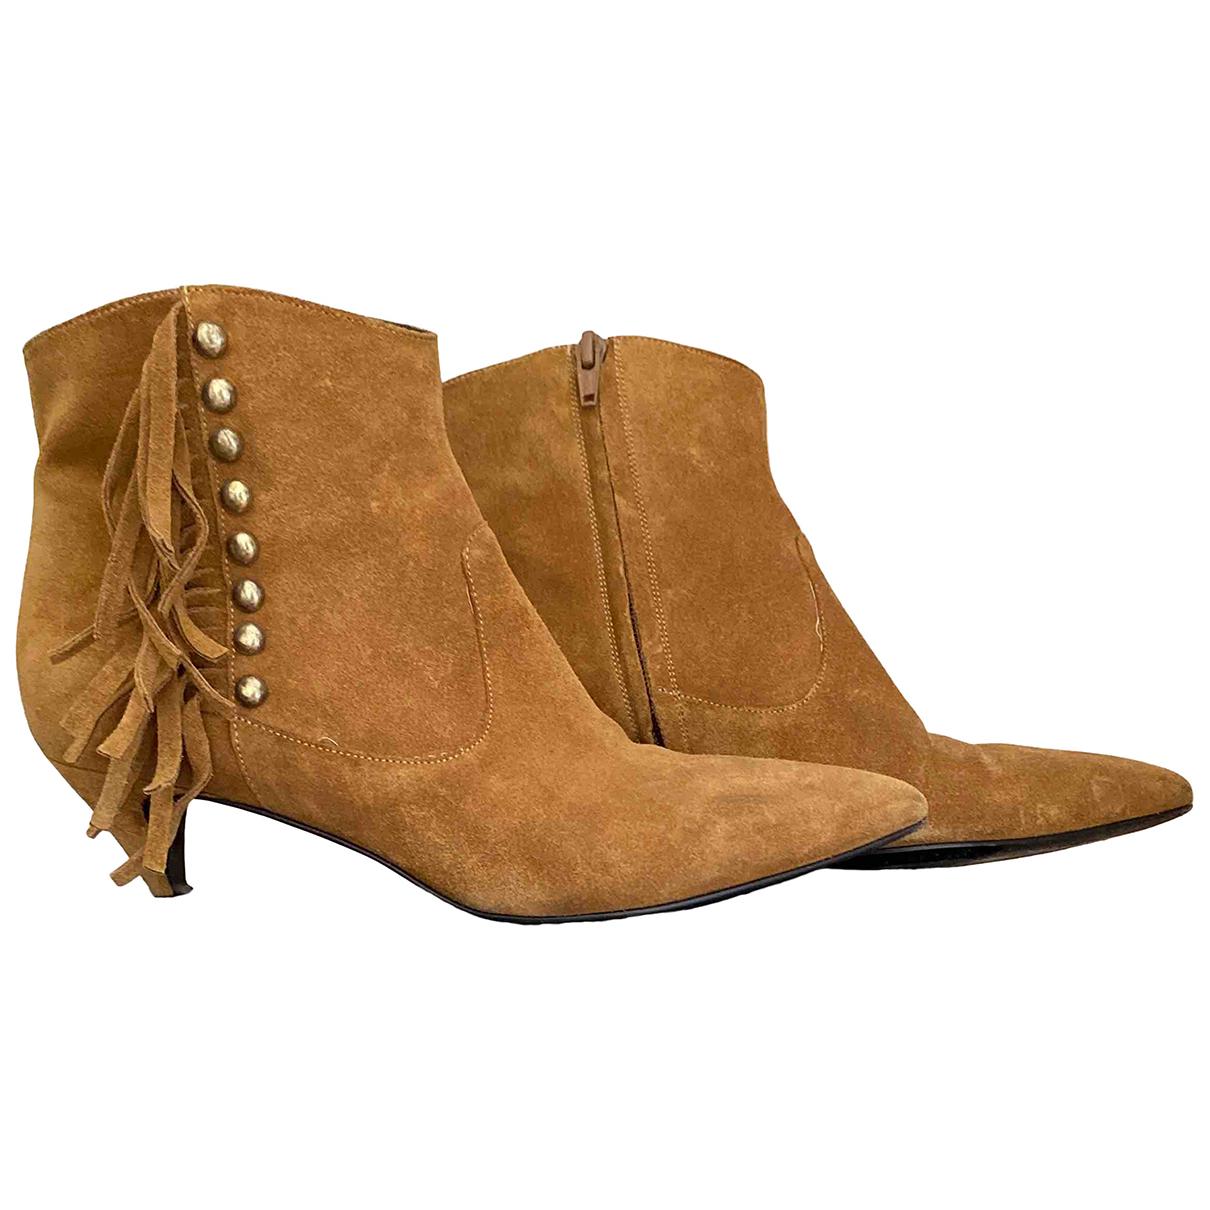 Saint Laurent \N Suede Ankle boots for Women 38.5 IT